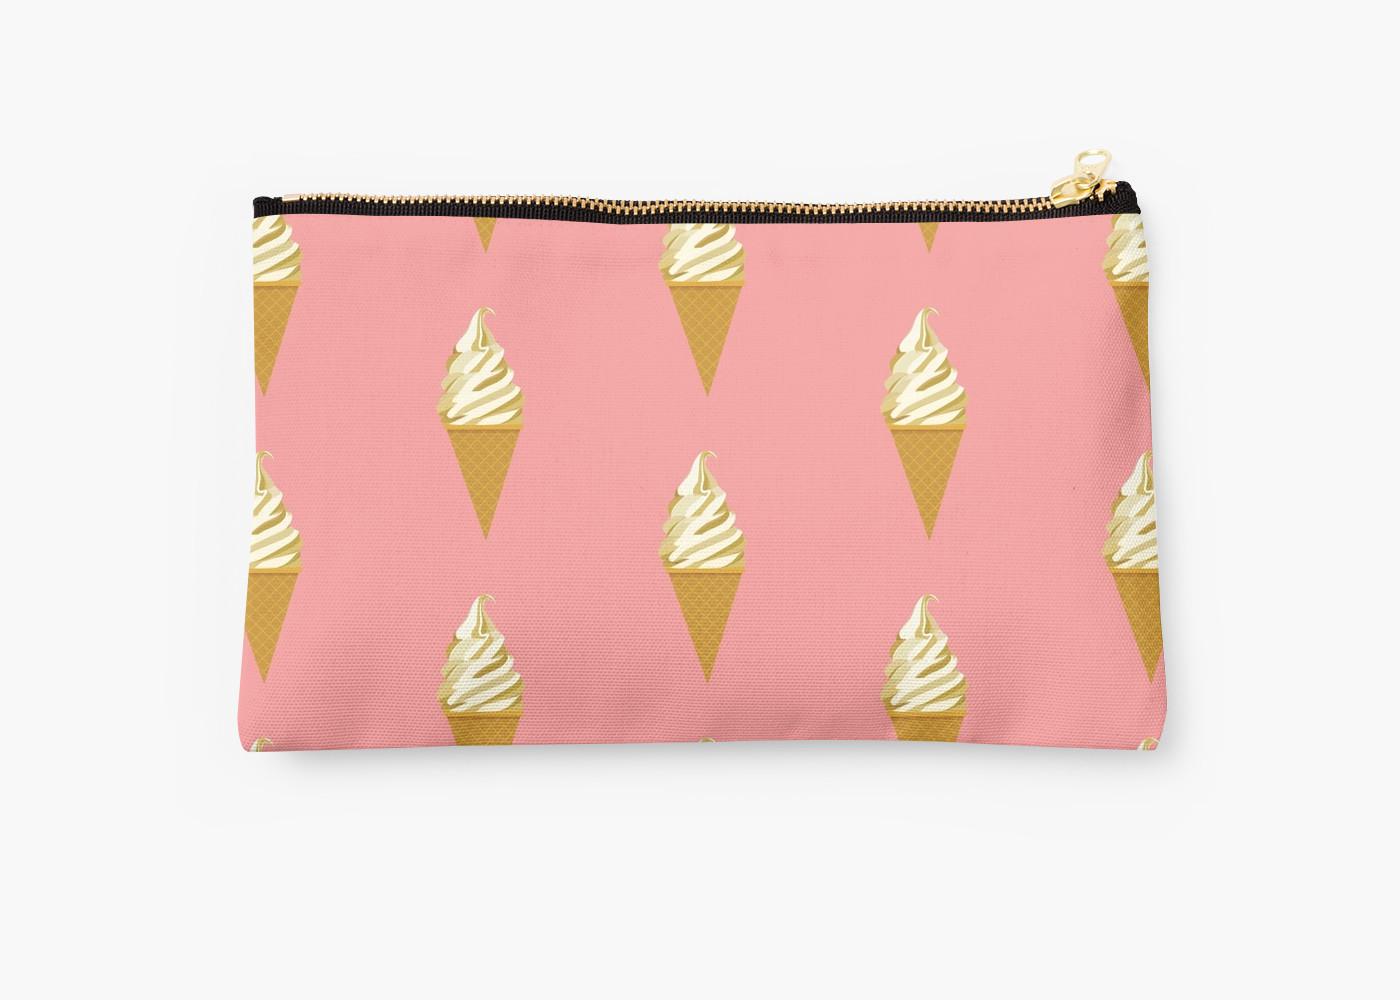 Clutch with vanilla ice cream cone pattern